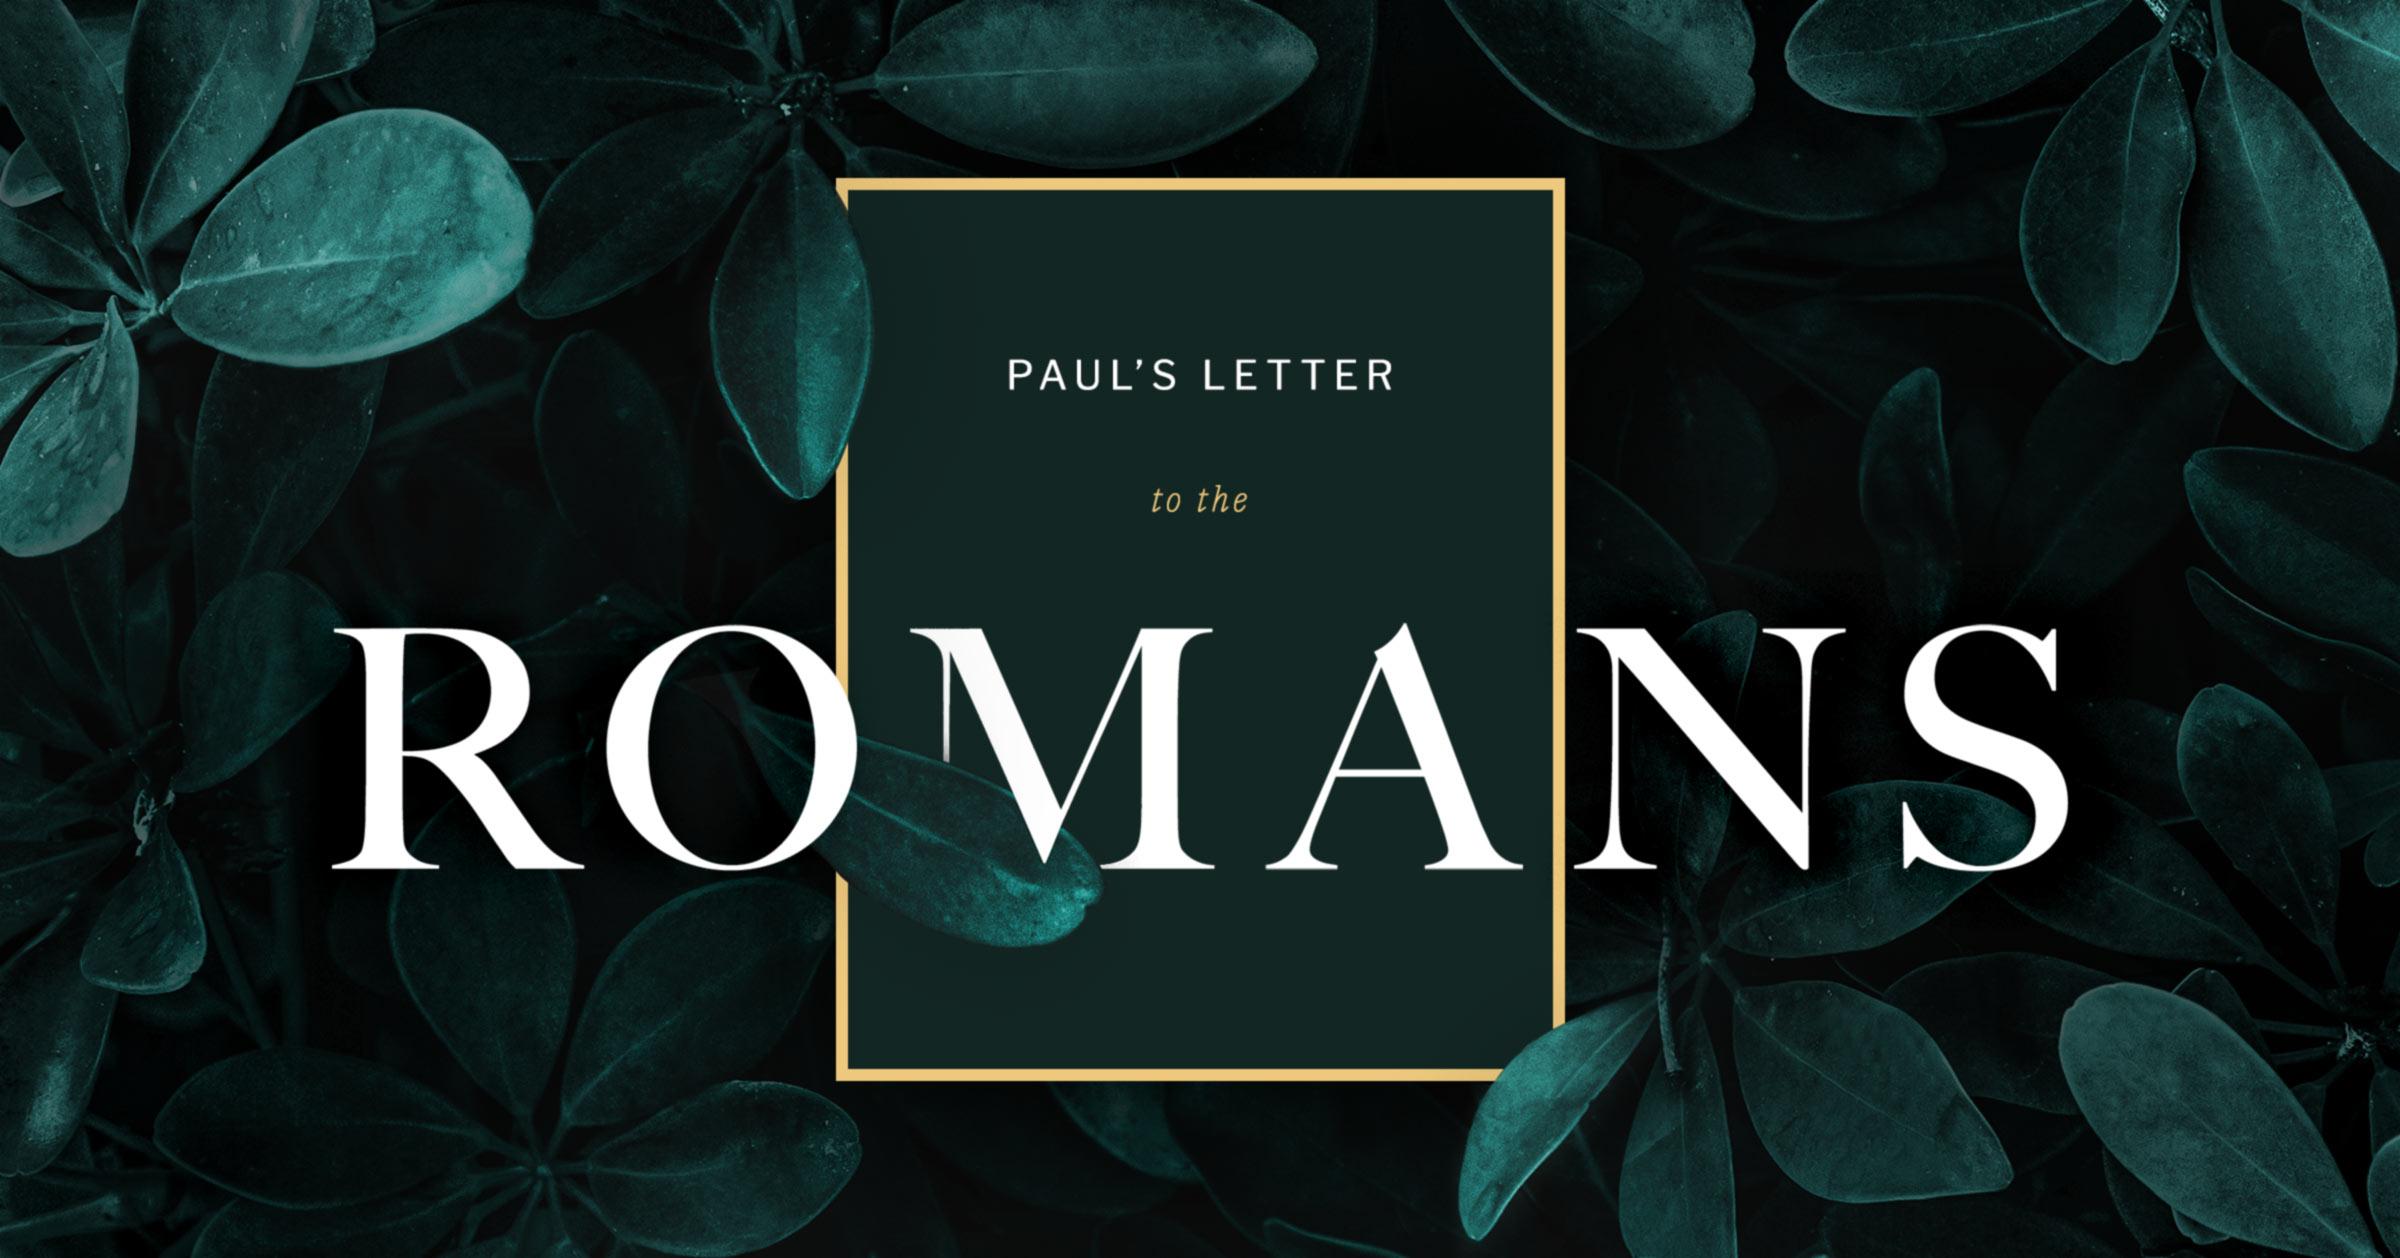 PV Bible Church sermon expository study through Romans ALT